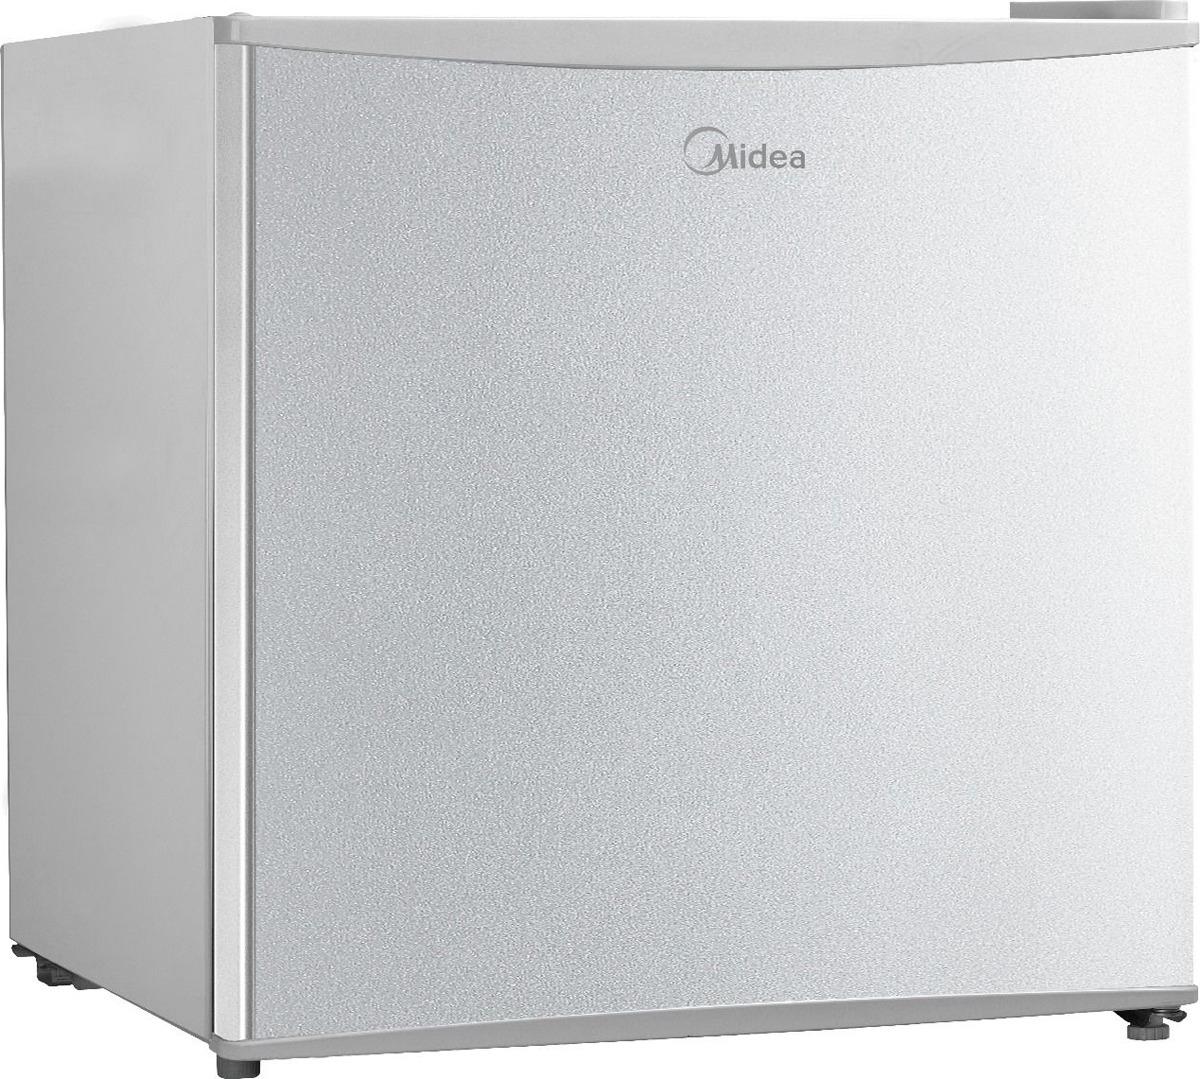 Холодильник Midea MR1049S, серебристый midea 65dme40101